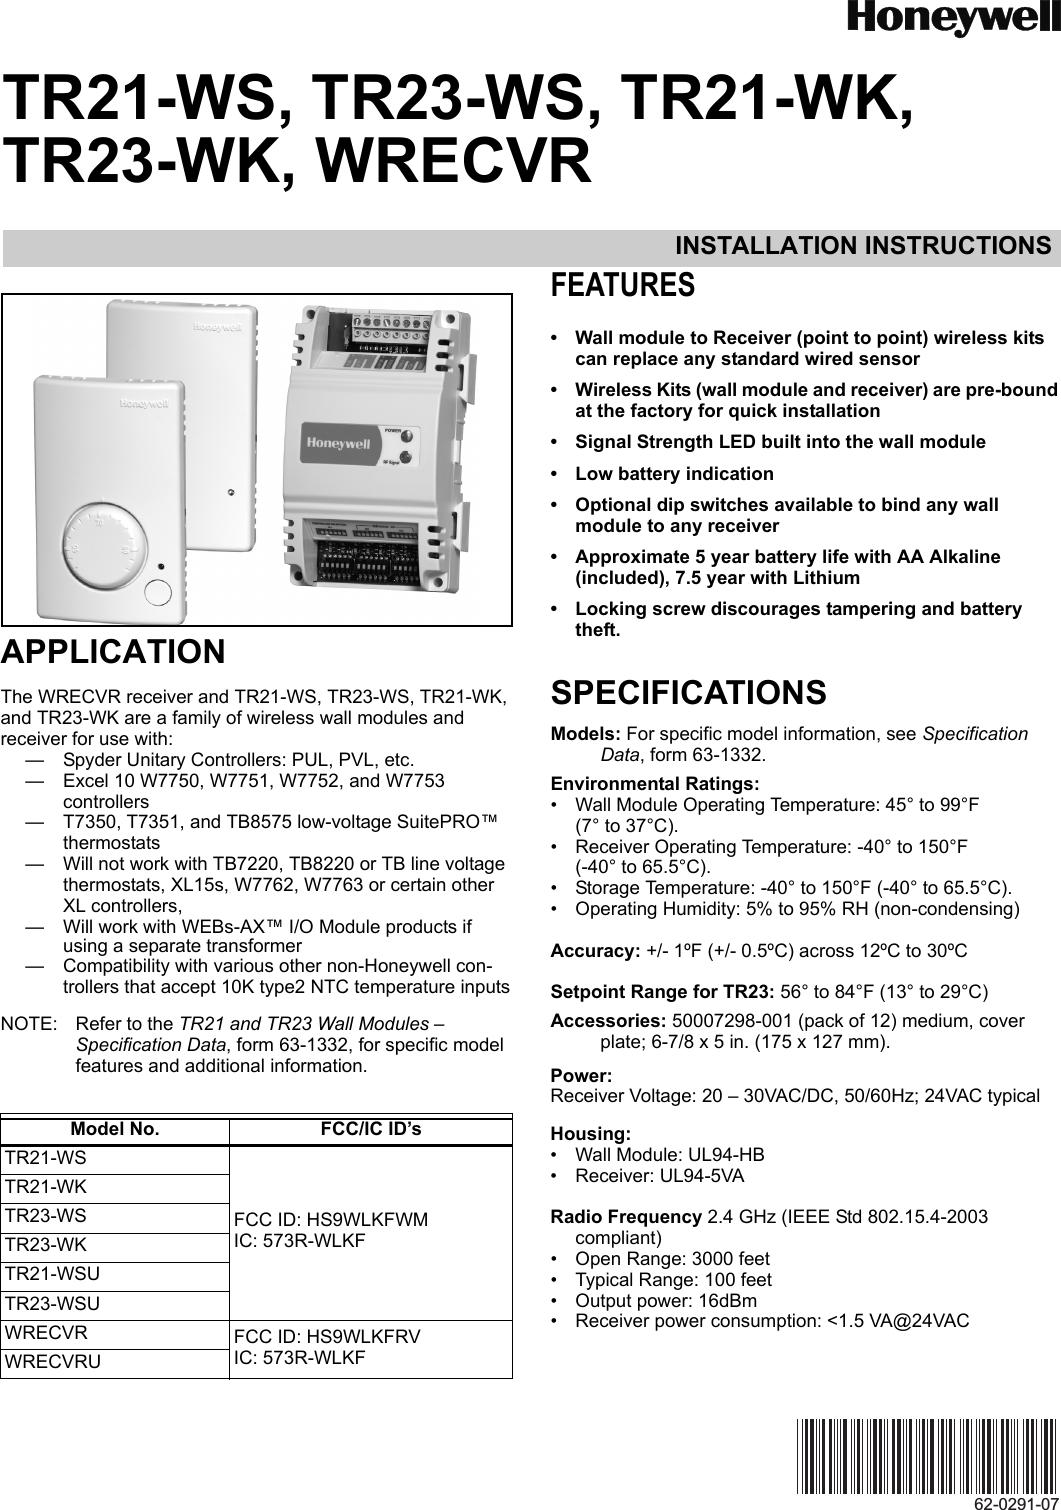 honeywell wireless thermostat instructions